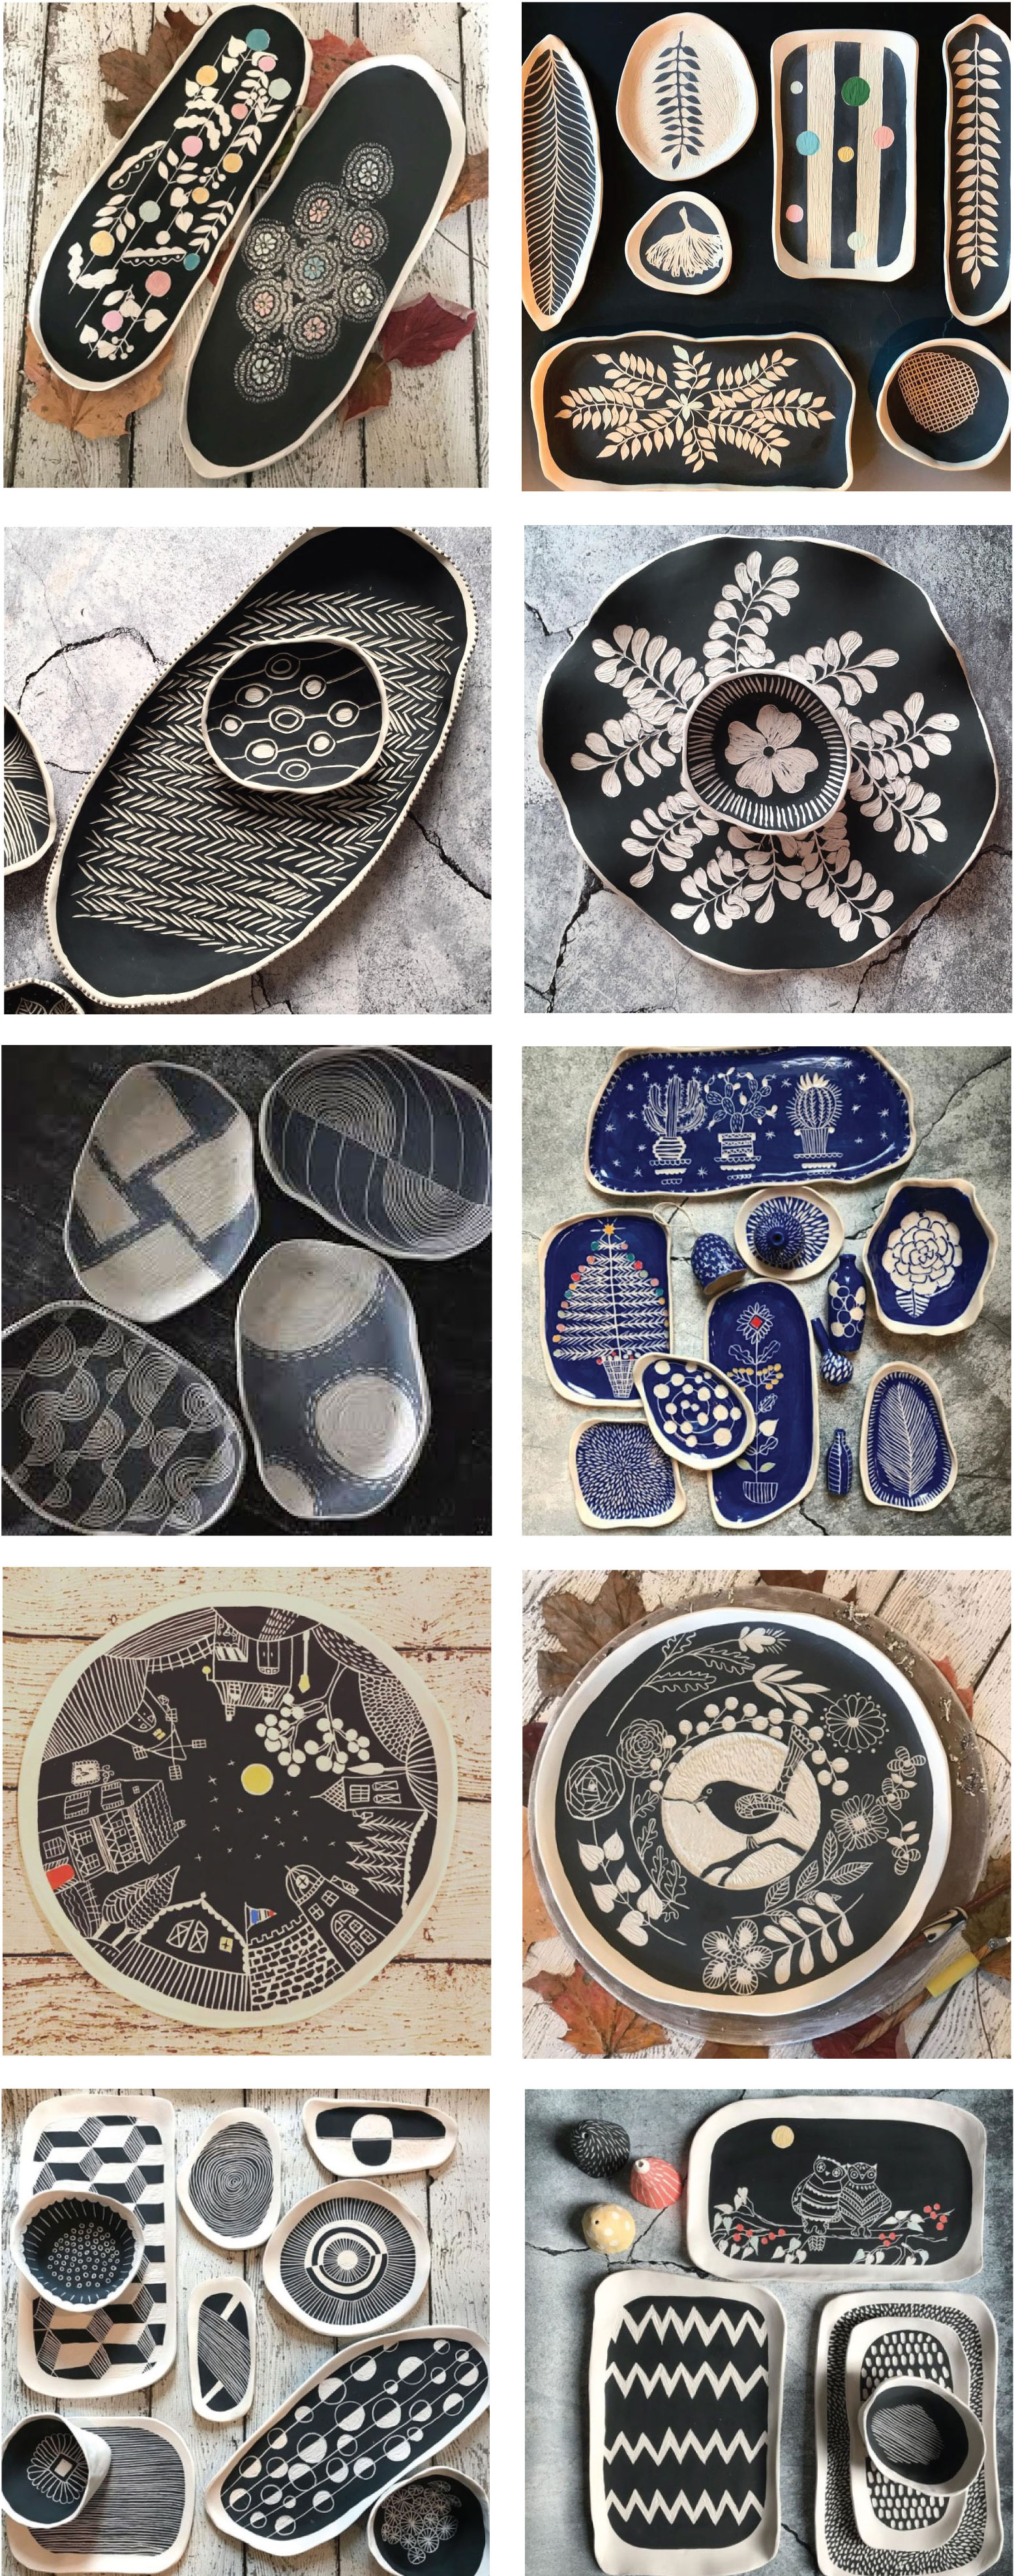 Jarjour Pottery